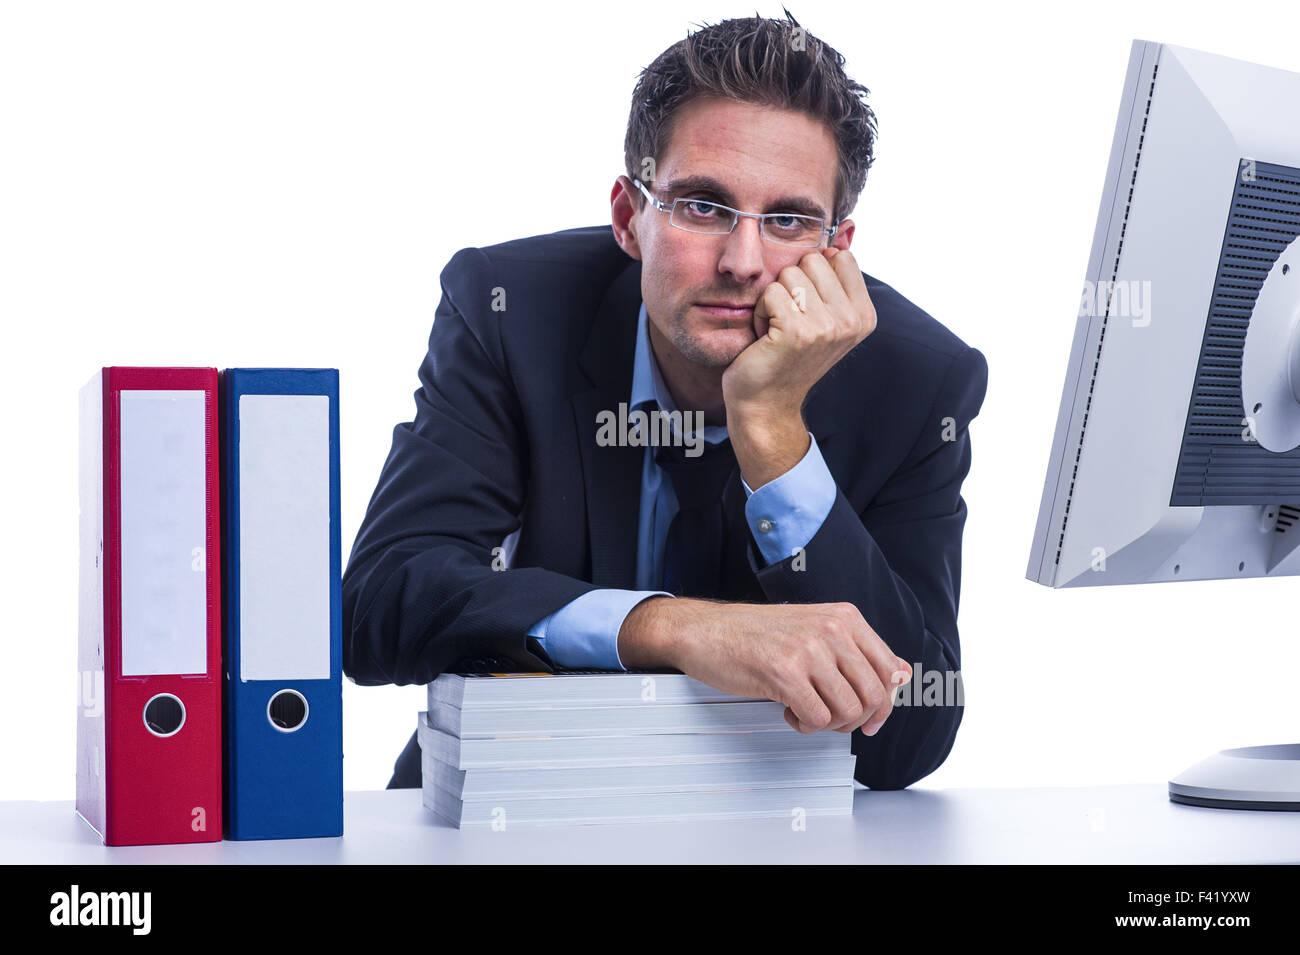 Businessman doubts his work - Stock Image